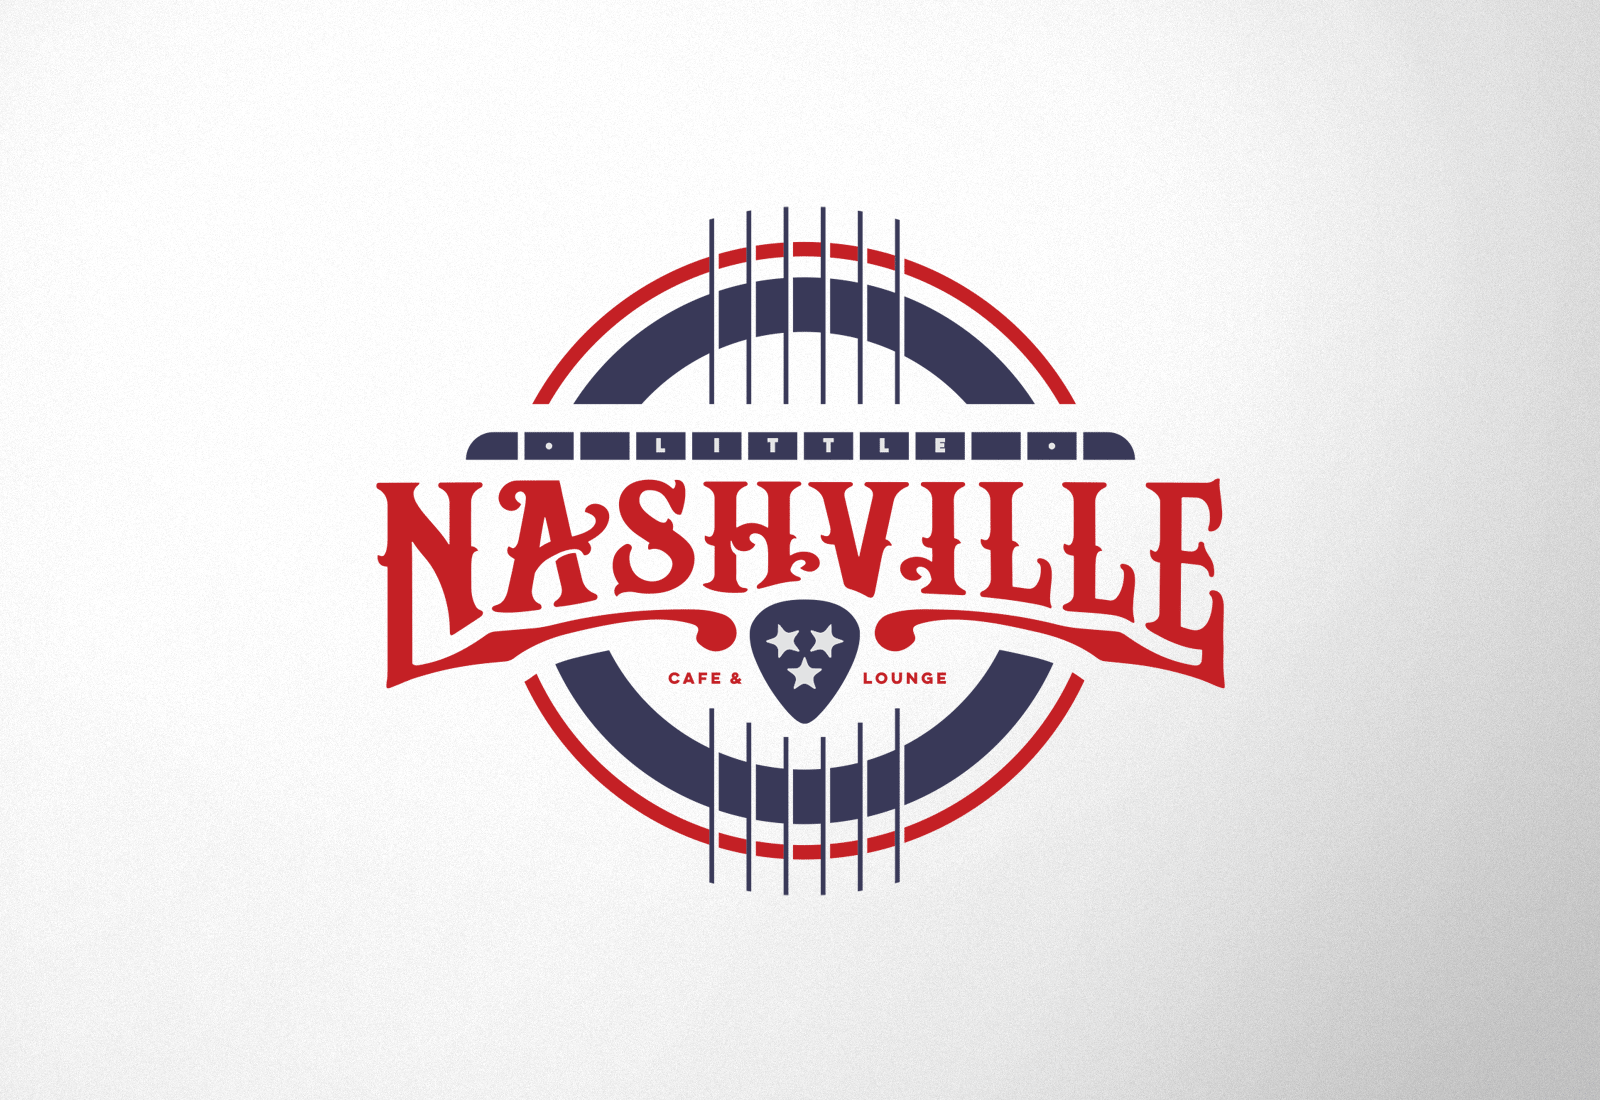 Little Nashville Music Venue Logo Design